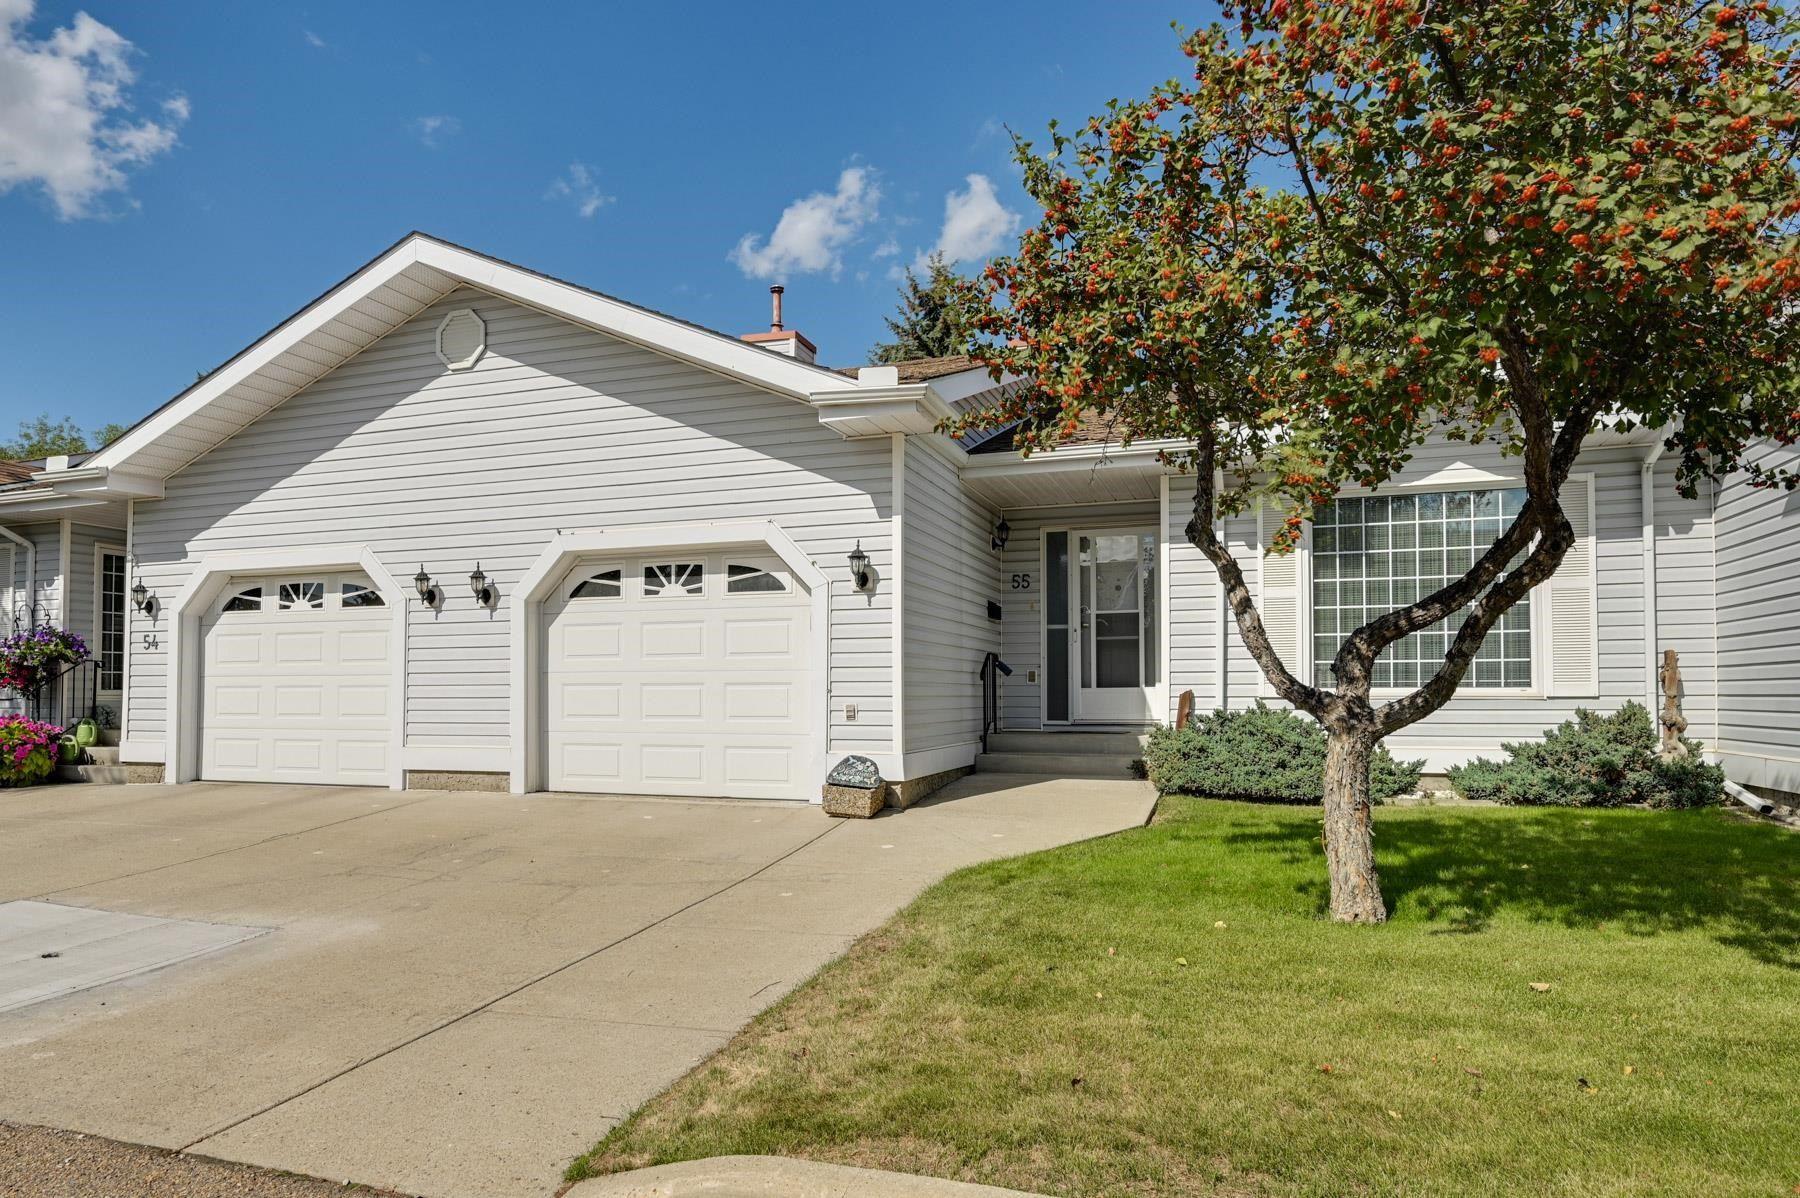 Main Photo: 55 9704 165 Street in Edmonton: Zone 22 House Half Duplex for sale : MLS®# E4260342